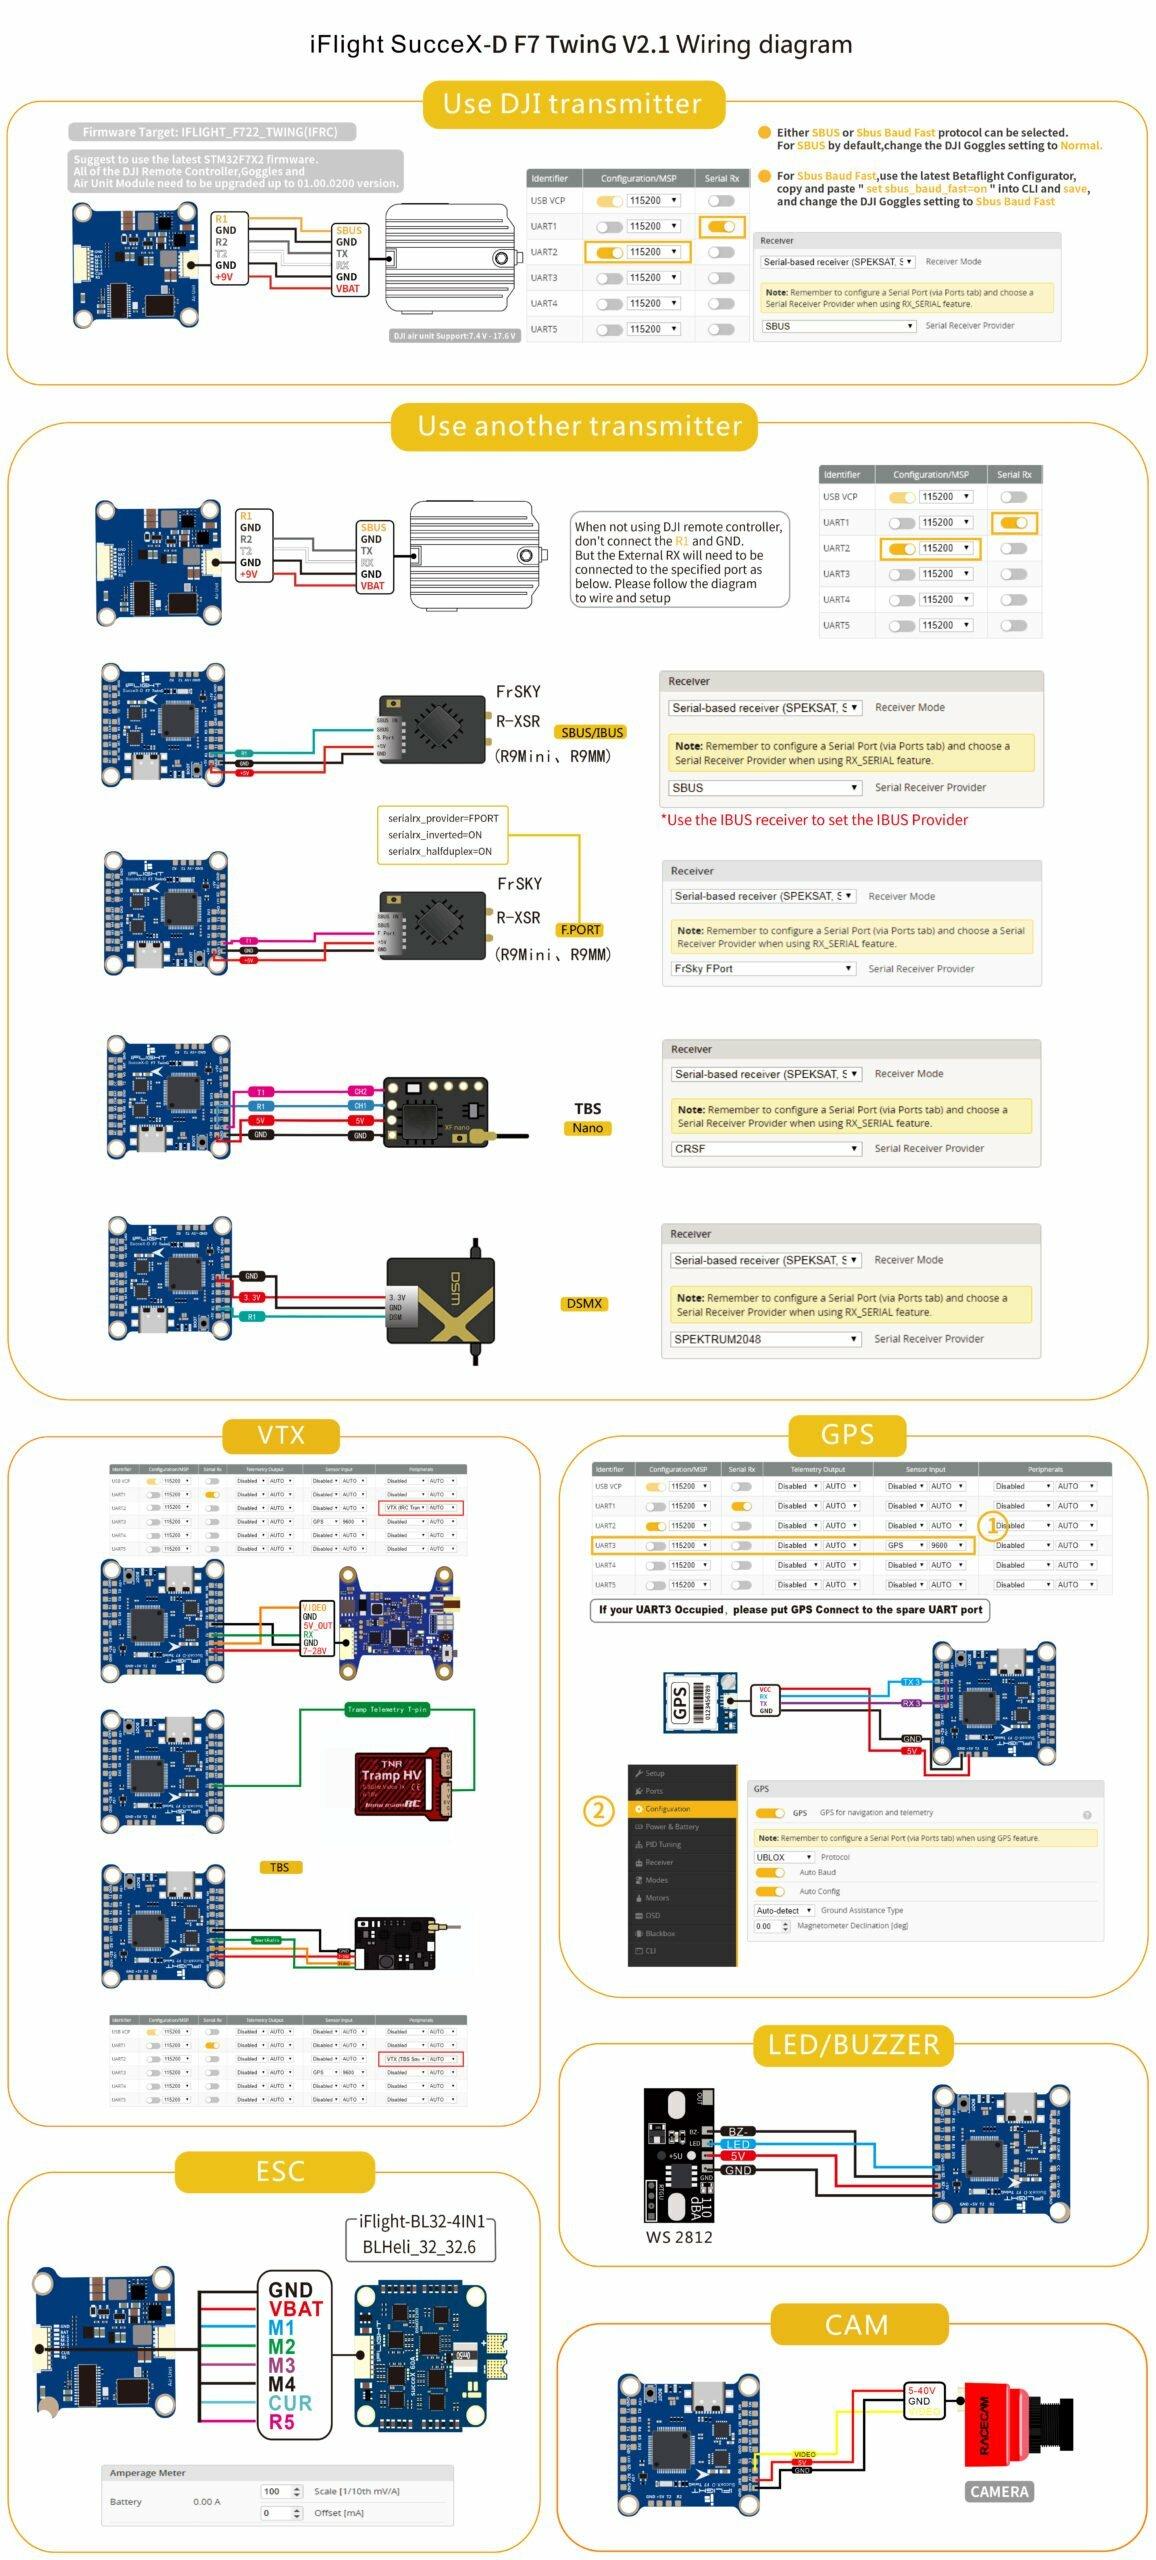 iflight SUCCEX D F7 TWING V2.1 wiring diagram mantisfpv.pdf scaled